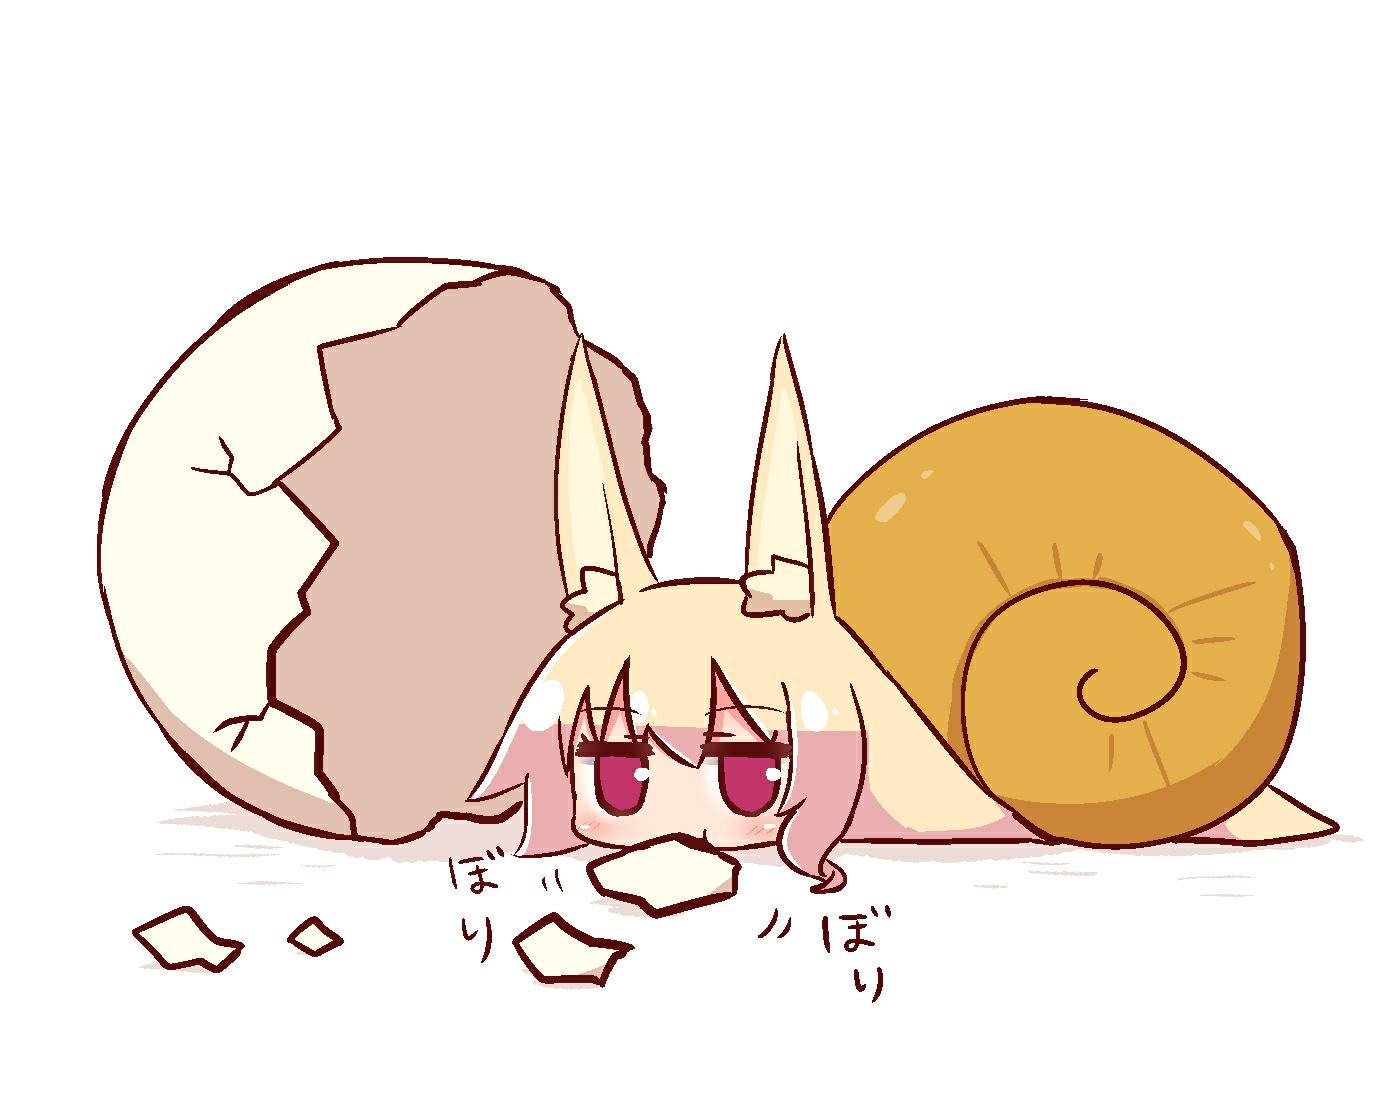 kemomimi酱插画图片